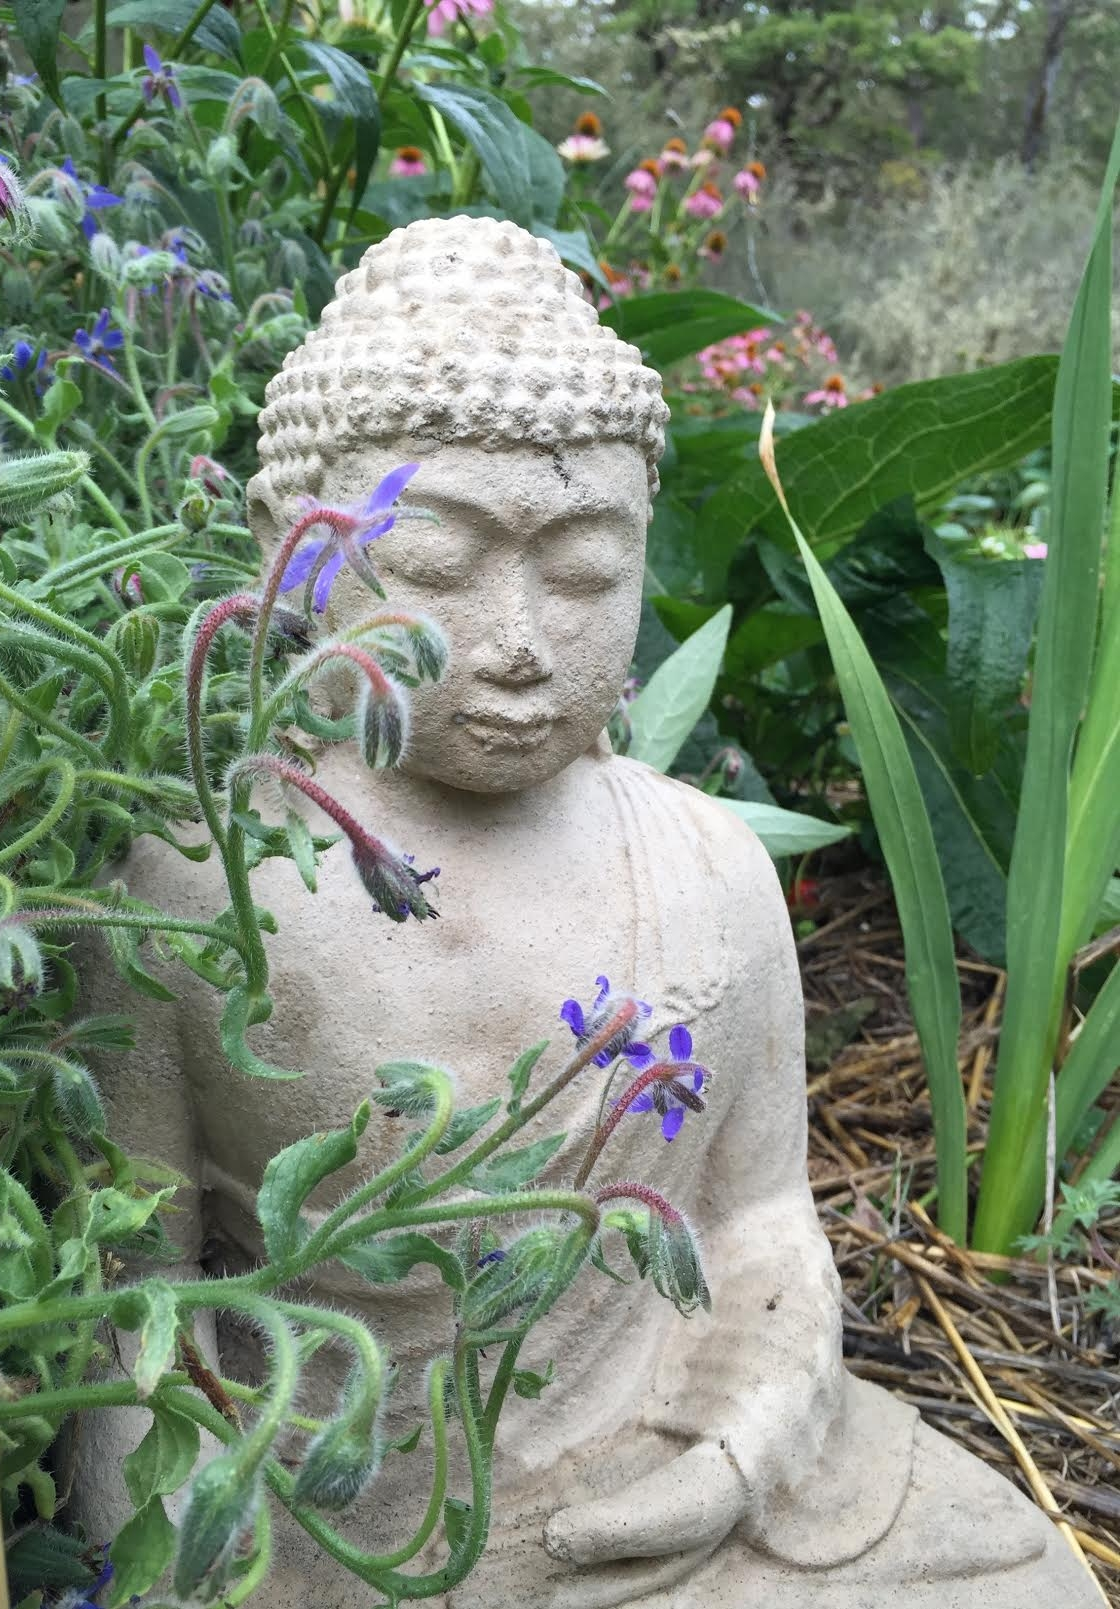 Blue Star Shaped Blossoms decorating the garden (Borago officinalis), and Echinacea purpurea